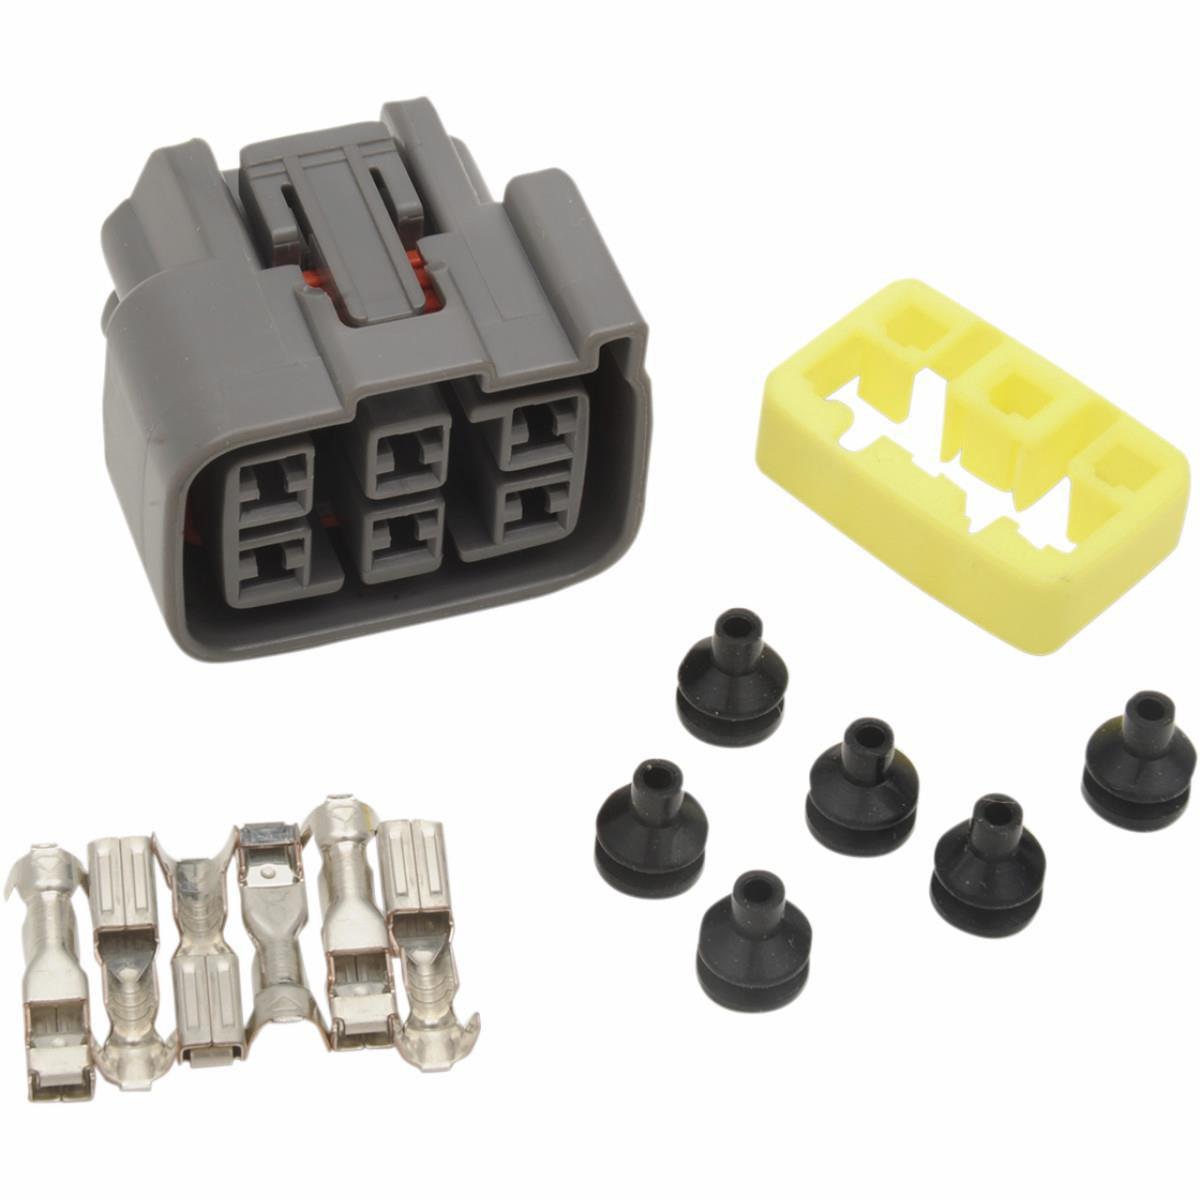 Ricks Motorsport Electric 11-114 Rectifier/Regulator Wiring Harness on